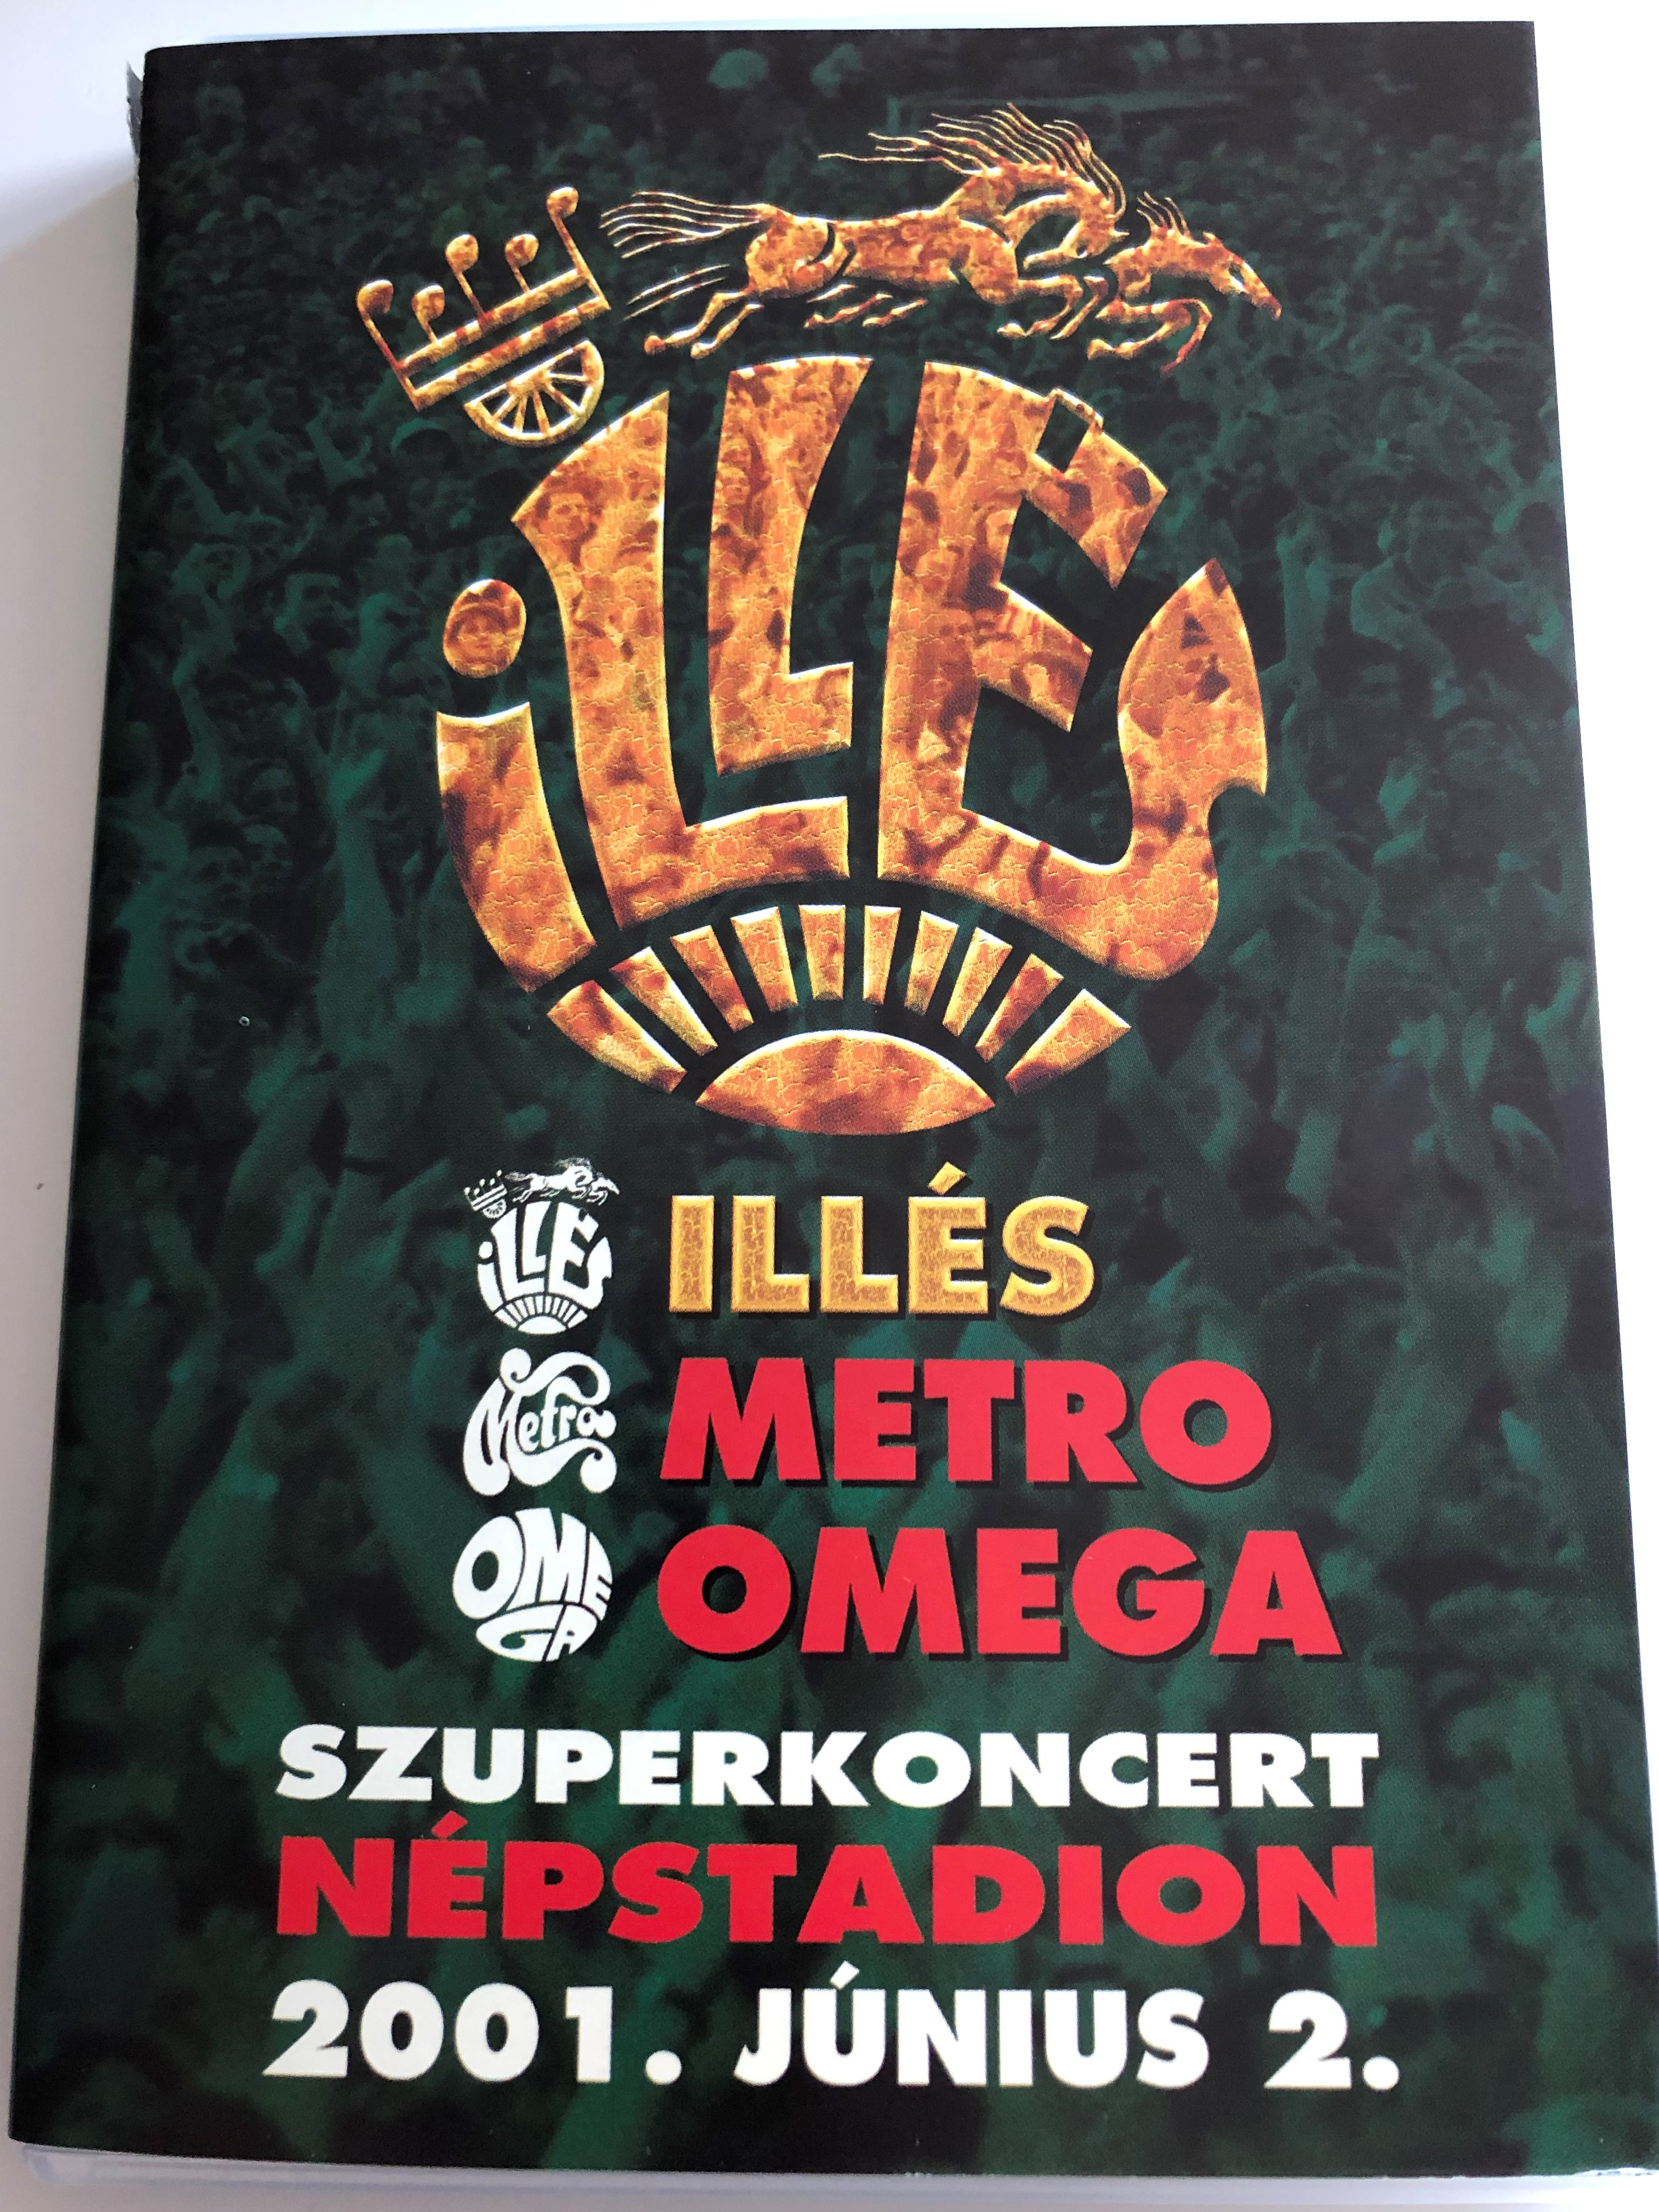 ill-s-szuperkoncert-dvd-2001-n-pstadion-2001-j-nius-2-1.jpg